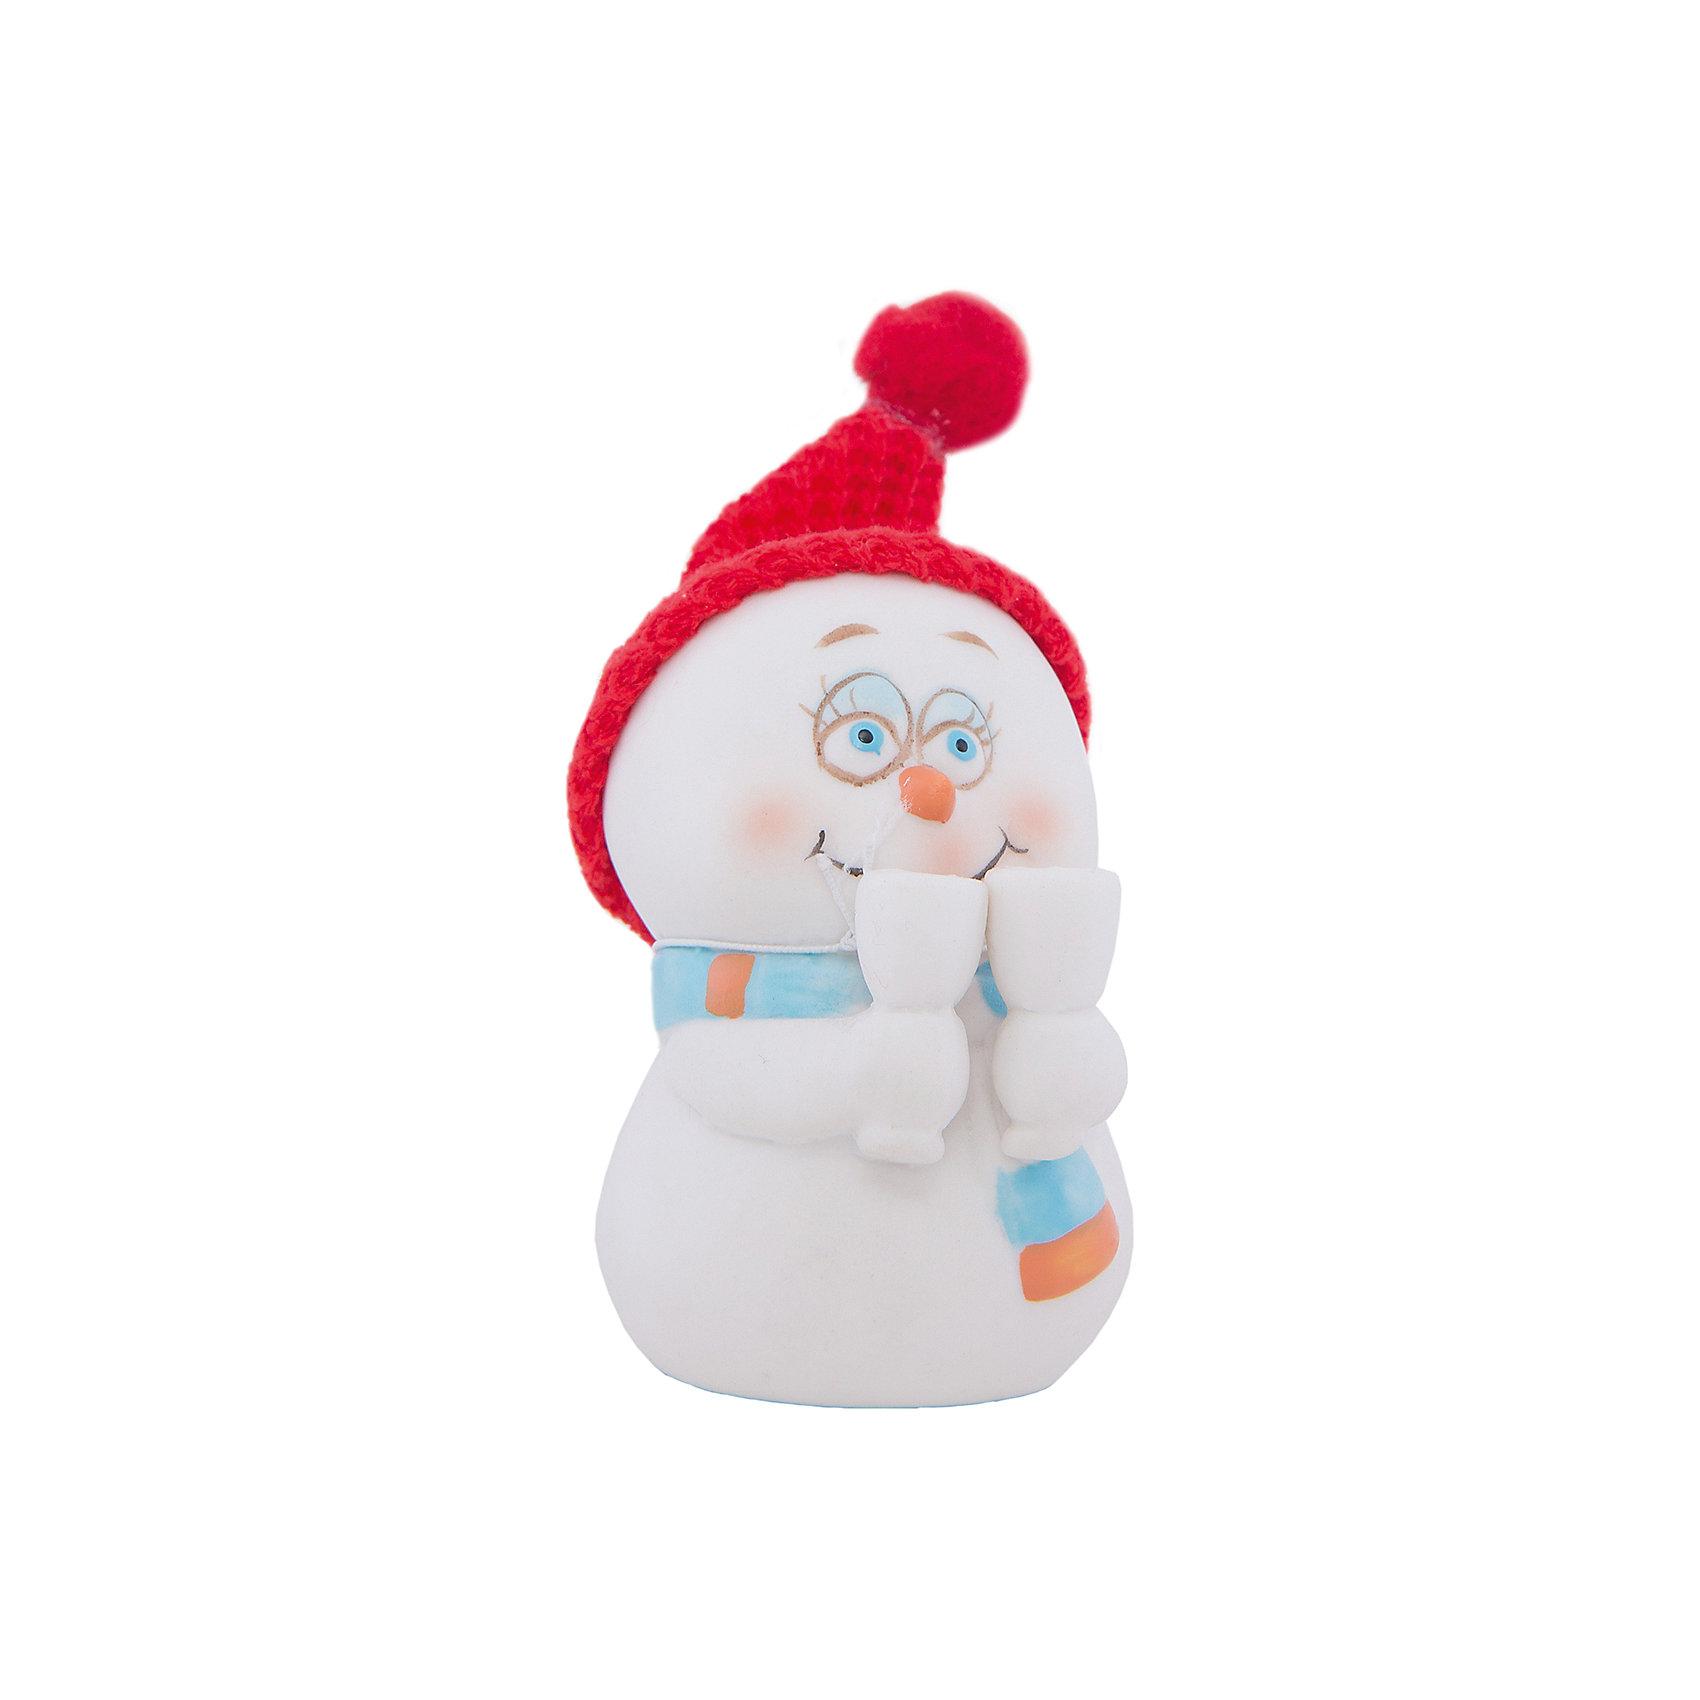 Новогодняя фигурка снеговика Снеговик с бокаламиНовогодняя фигурка снеговика Снеговик с бокалами арт.38338/120 (цв. карт.8см, керамика)<br><br>Ширина мм: 80<br>Глубина мм: 70<br>Высота мм: 90<br>Вес г: 138<br>Возраст от месяцев: 60<br>Возраст до месяцев: 600<br>Пол: Унисекс<br>Возраст: Детский<br>SKU: 5144557